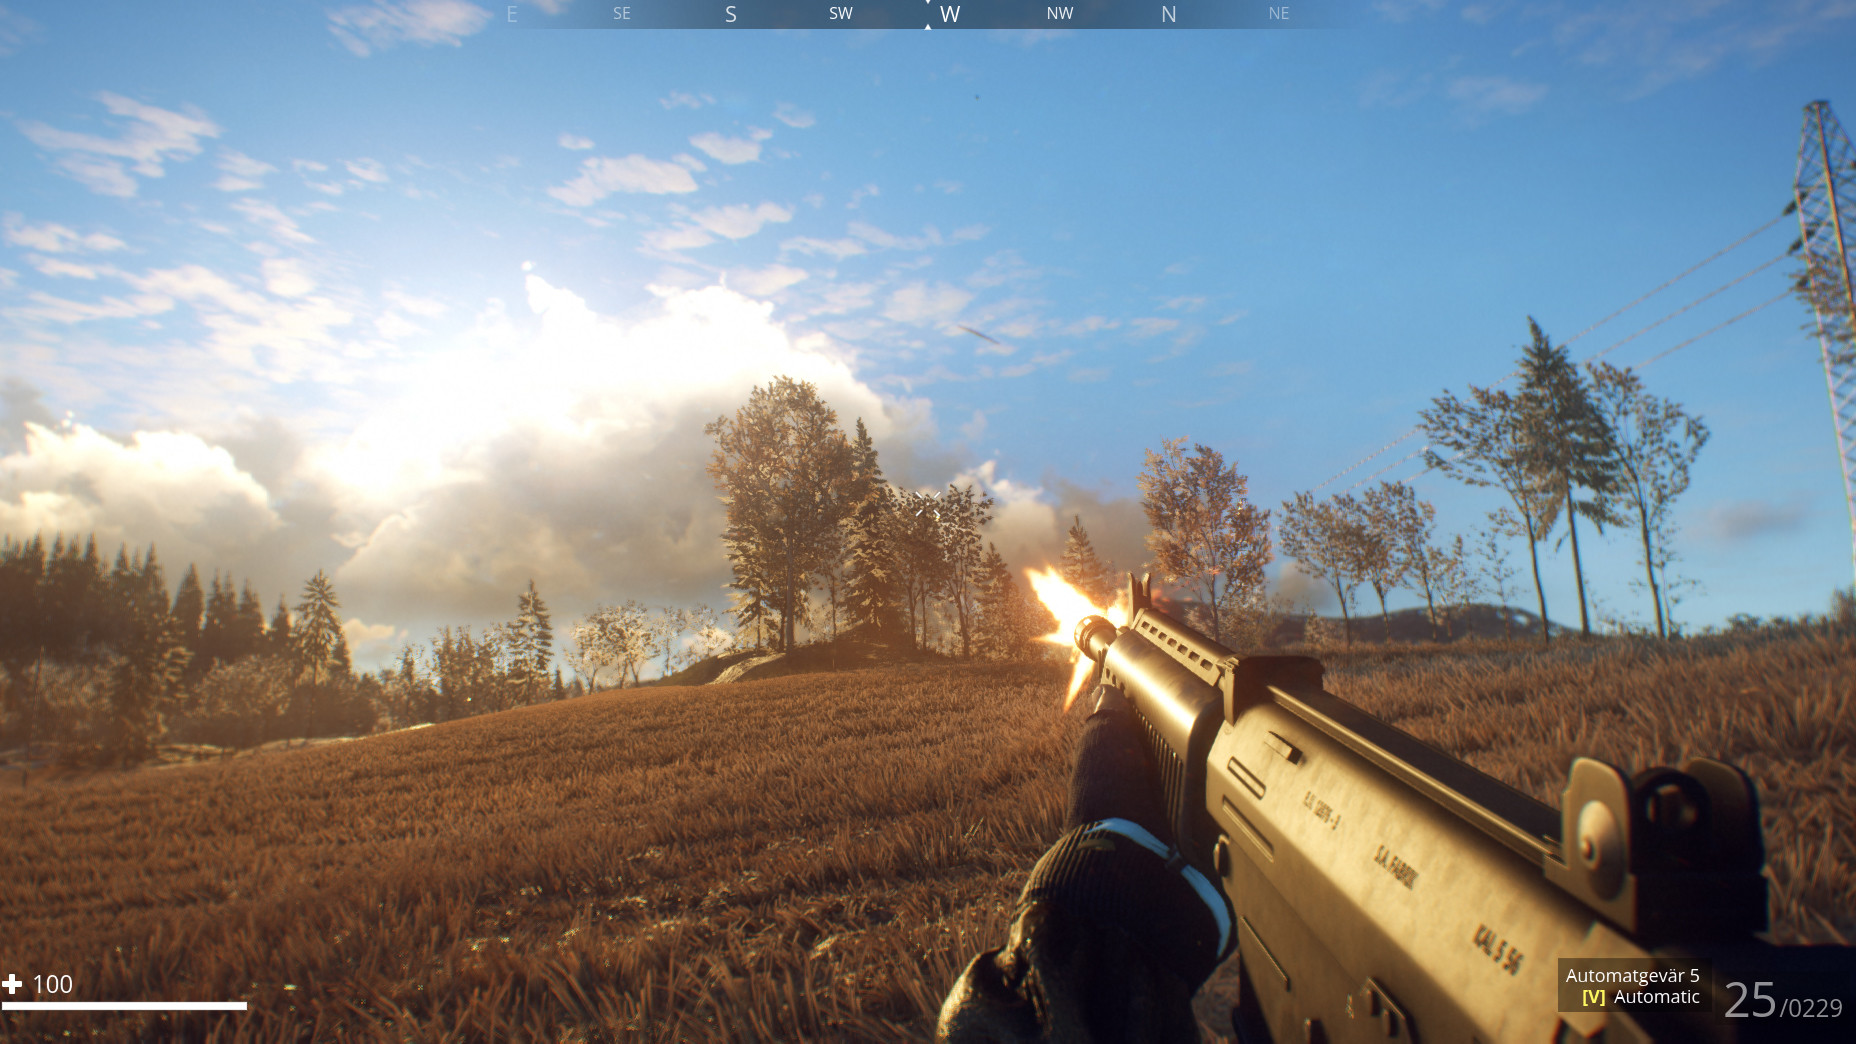 Daniel ketterman assault rifle5 ig